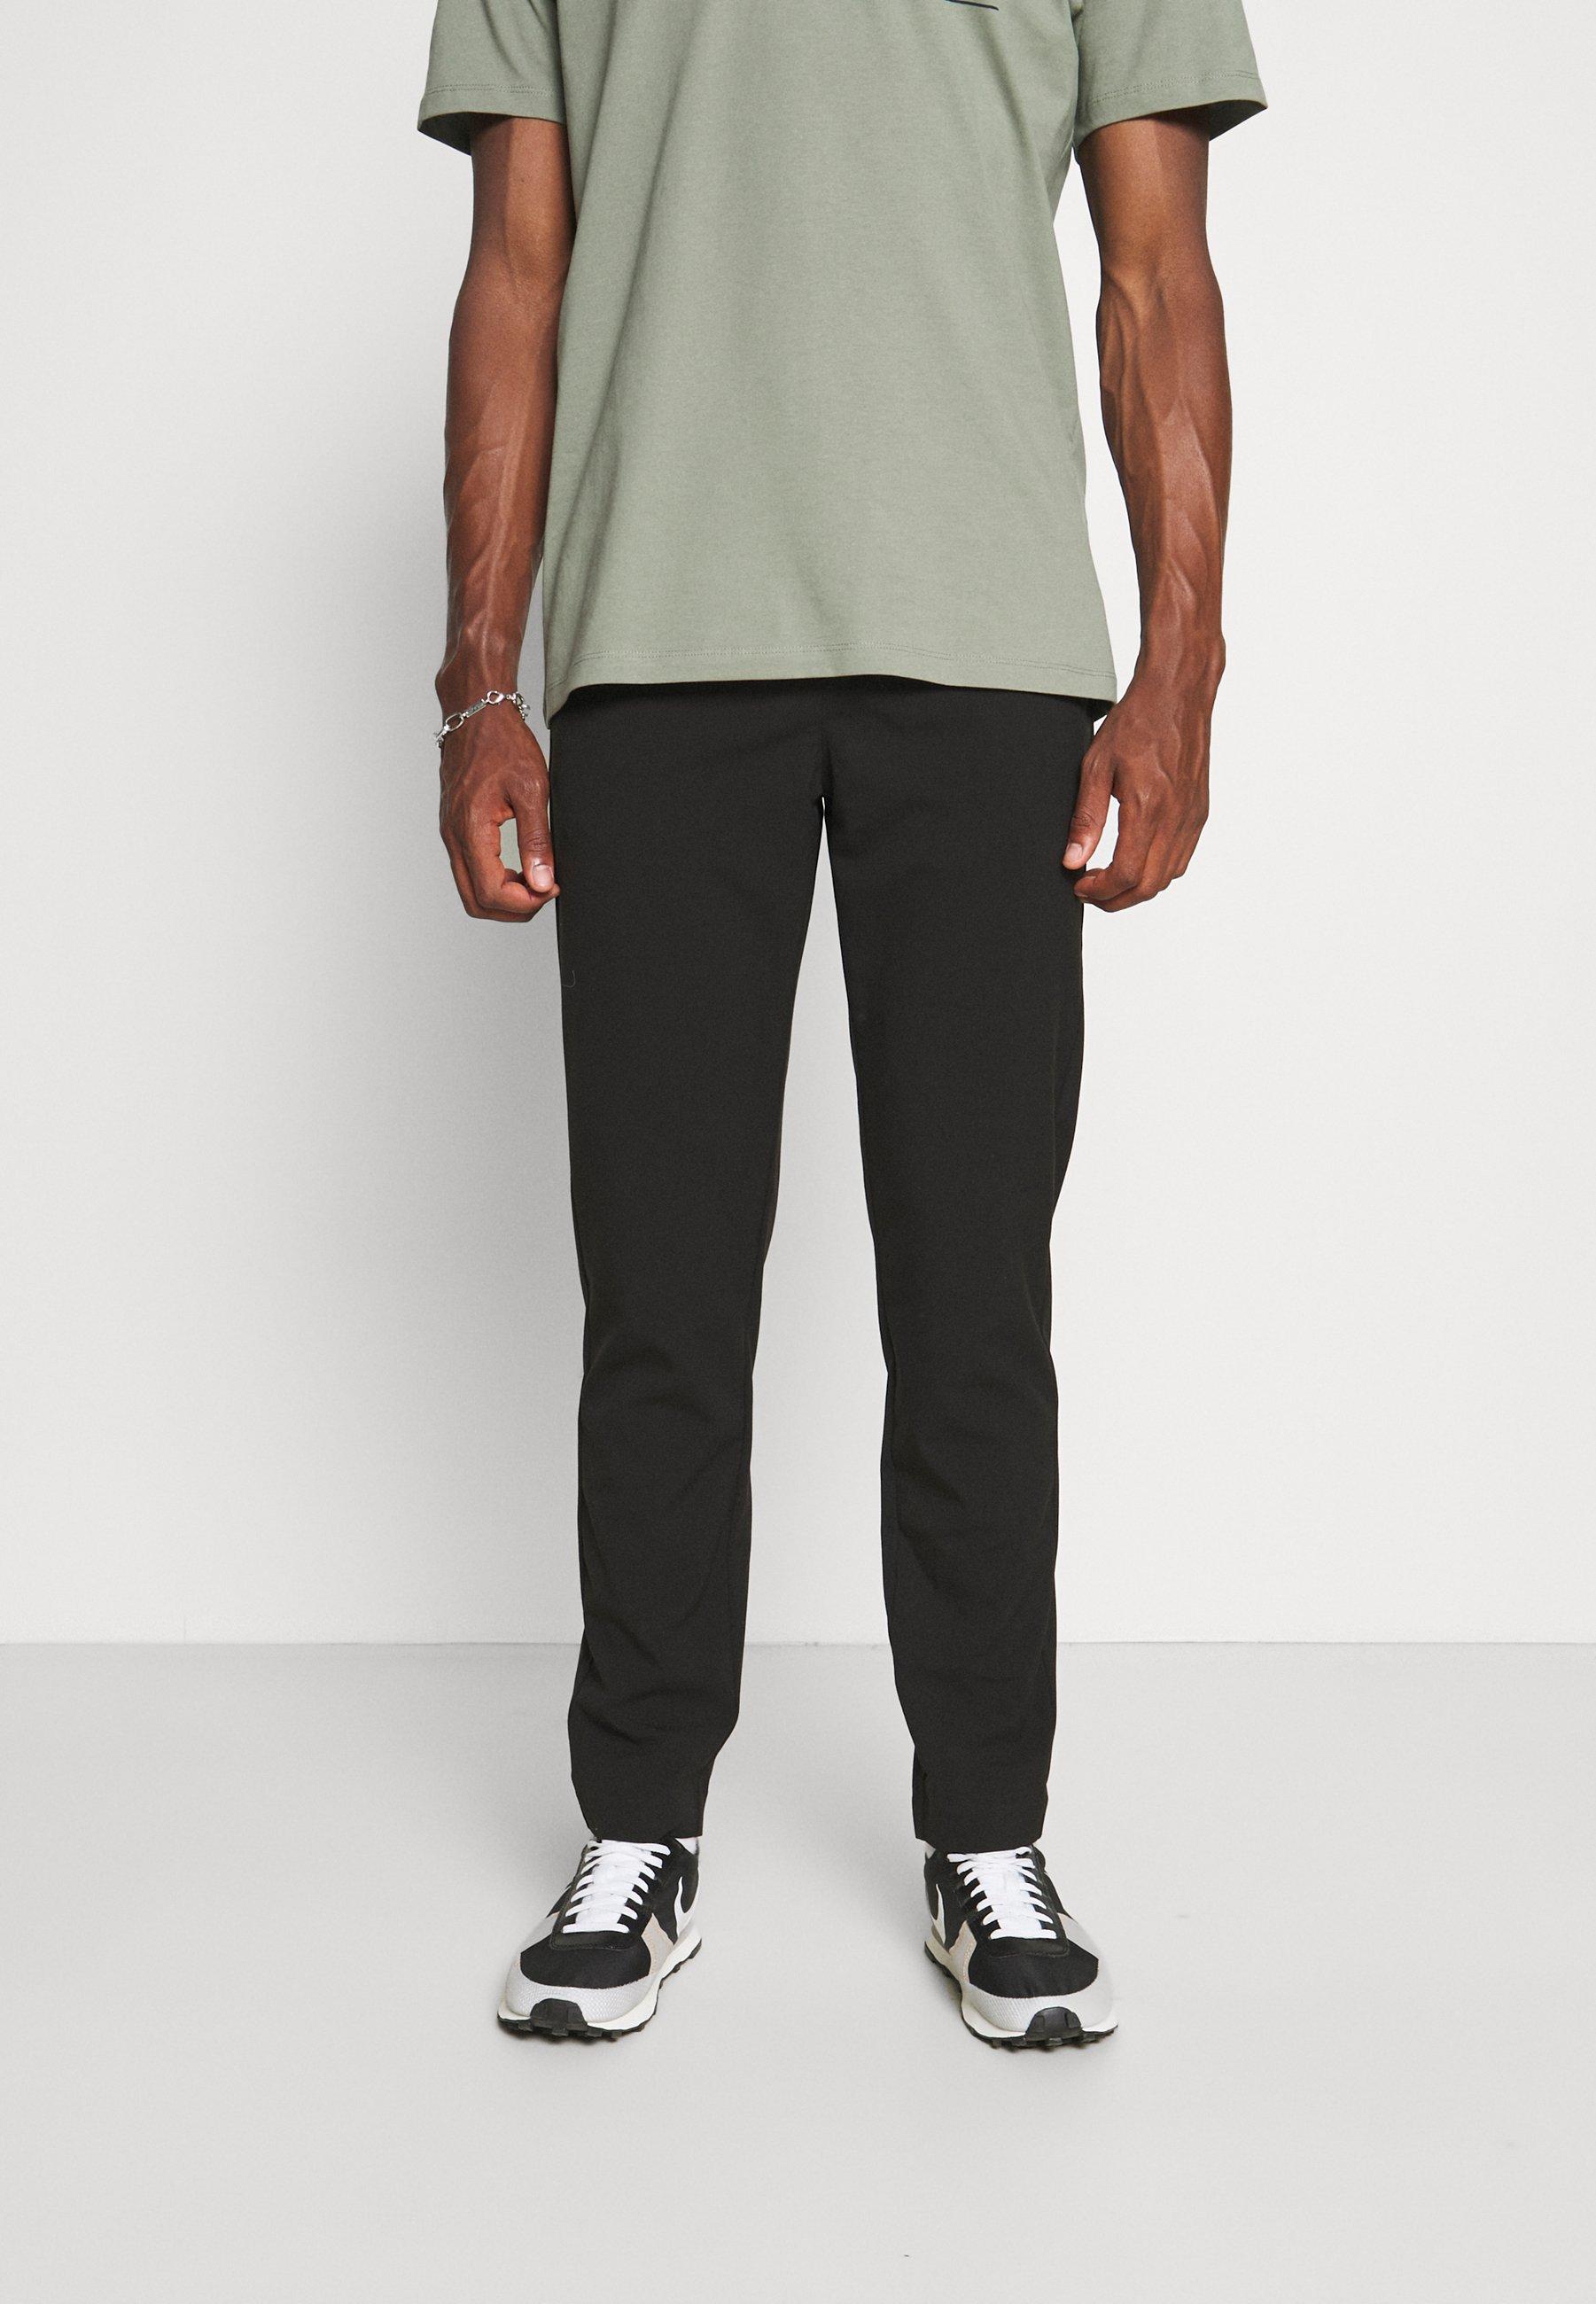 Uomo CLUB PANTS WITH DRAWSTRING - Pantaloni